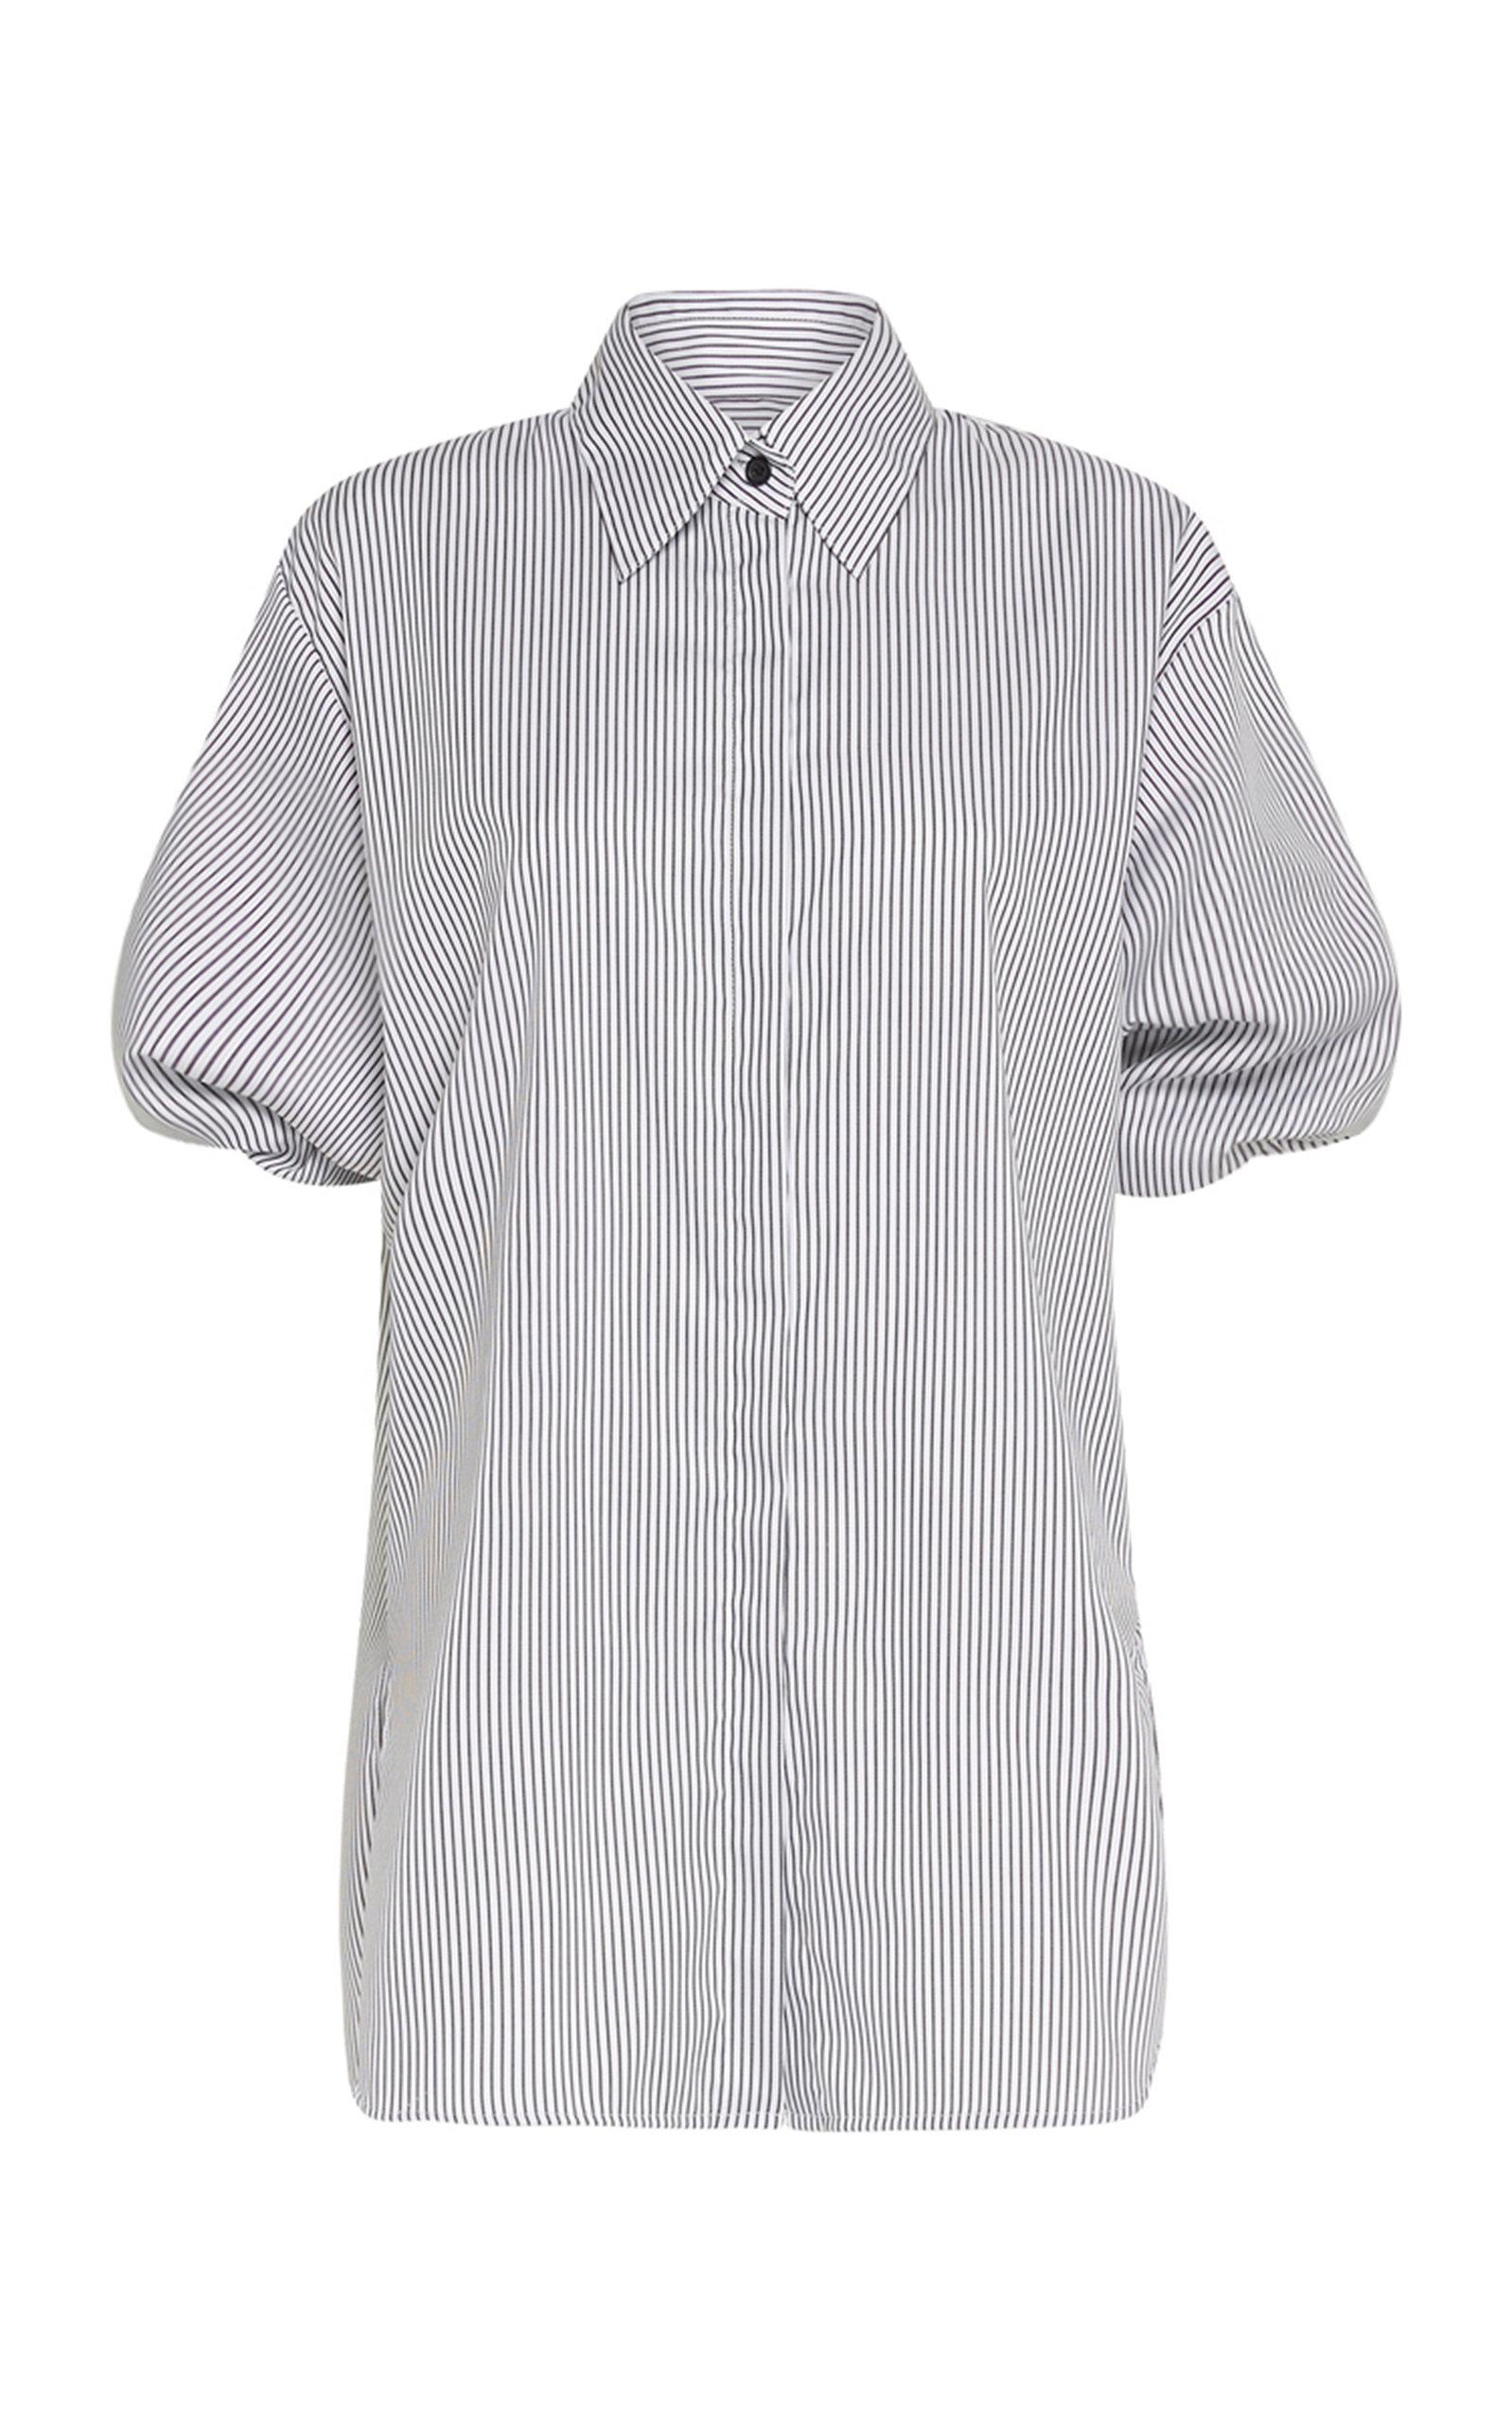 Women's Puff-Sleeve Striped Cotton Shirt